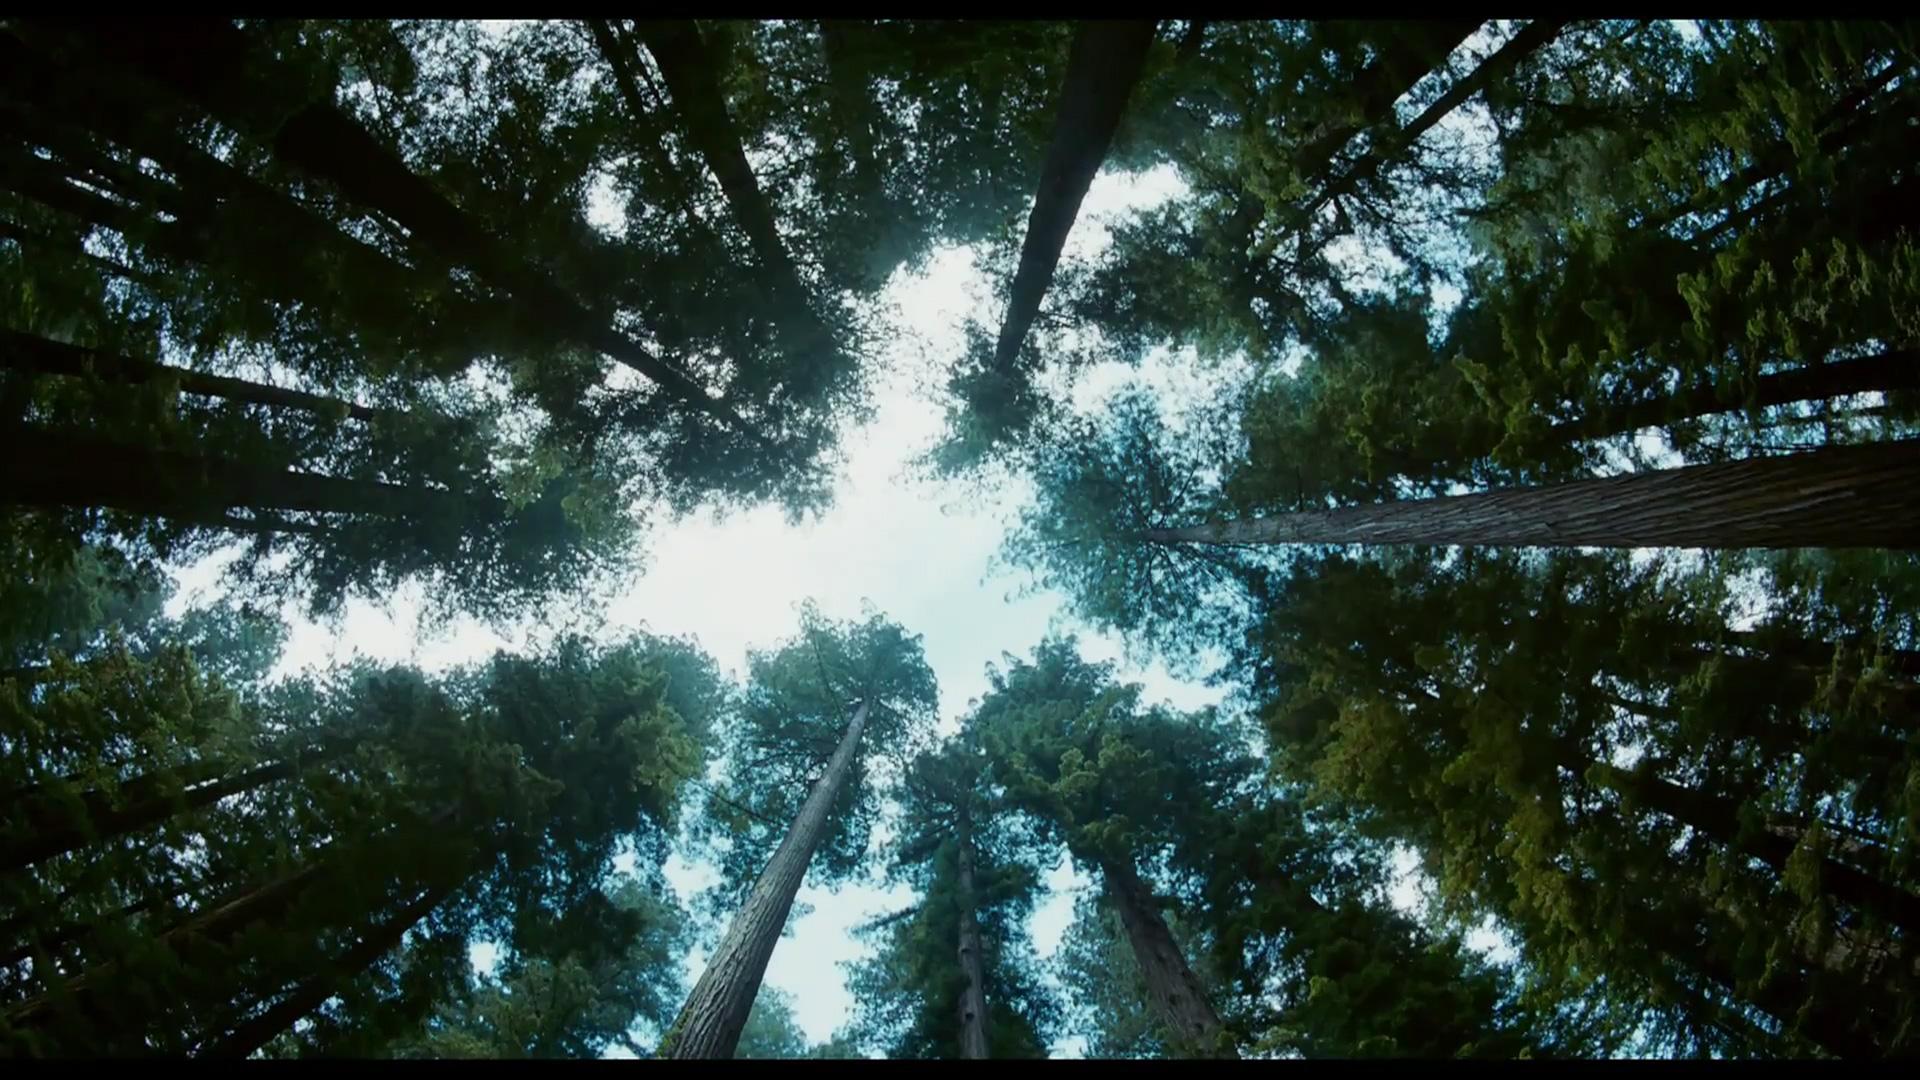 The Tree of Life - Trees